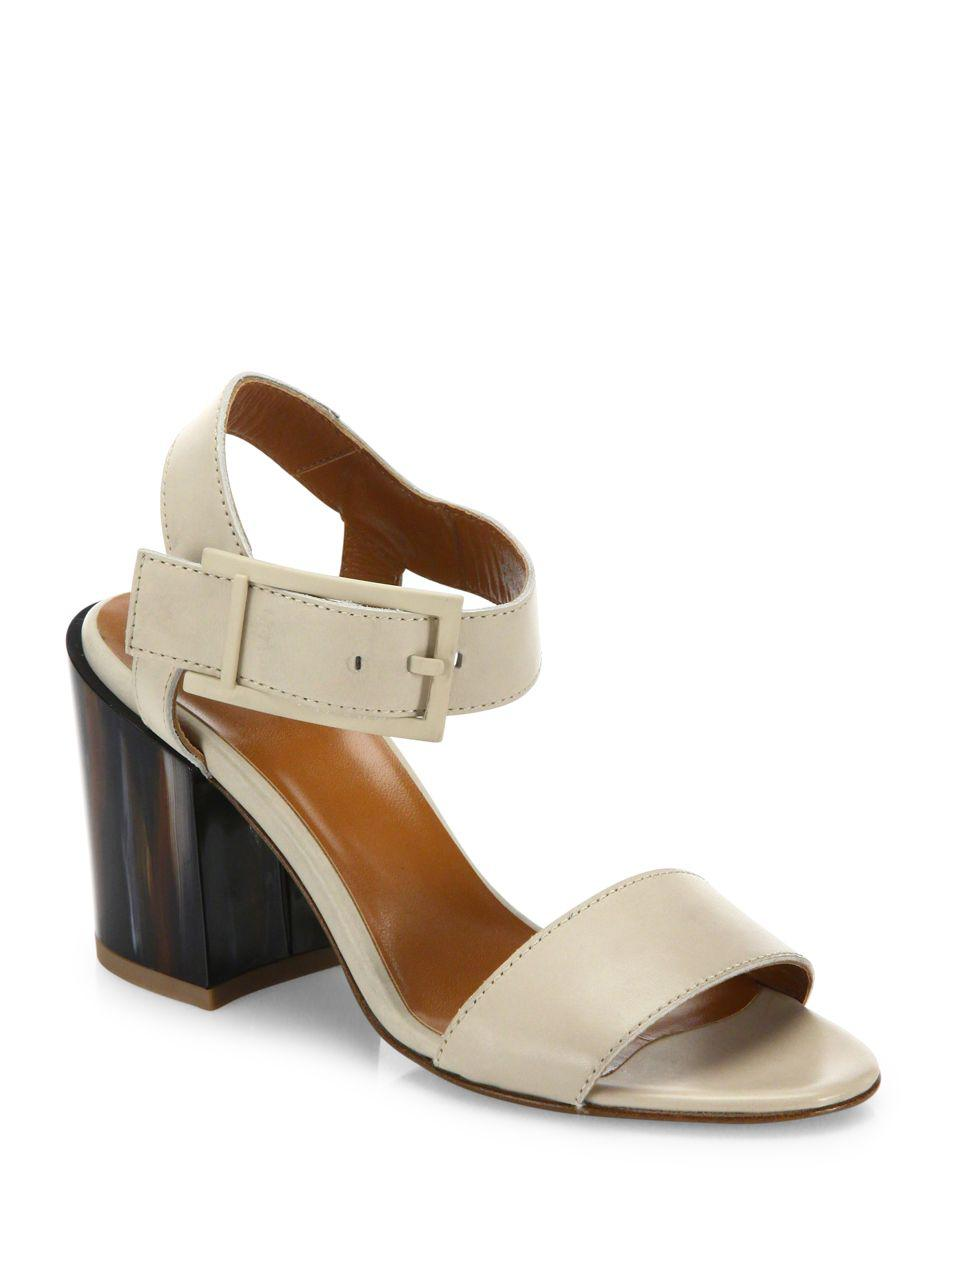 Aquatalia Fredia Leather Block Heel Sandals eK6yx